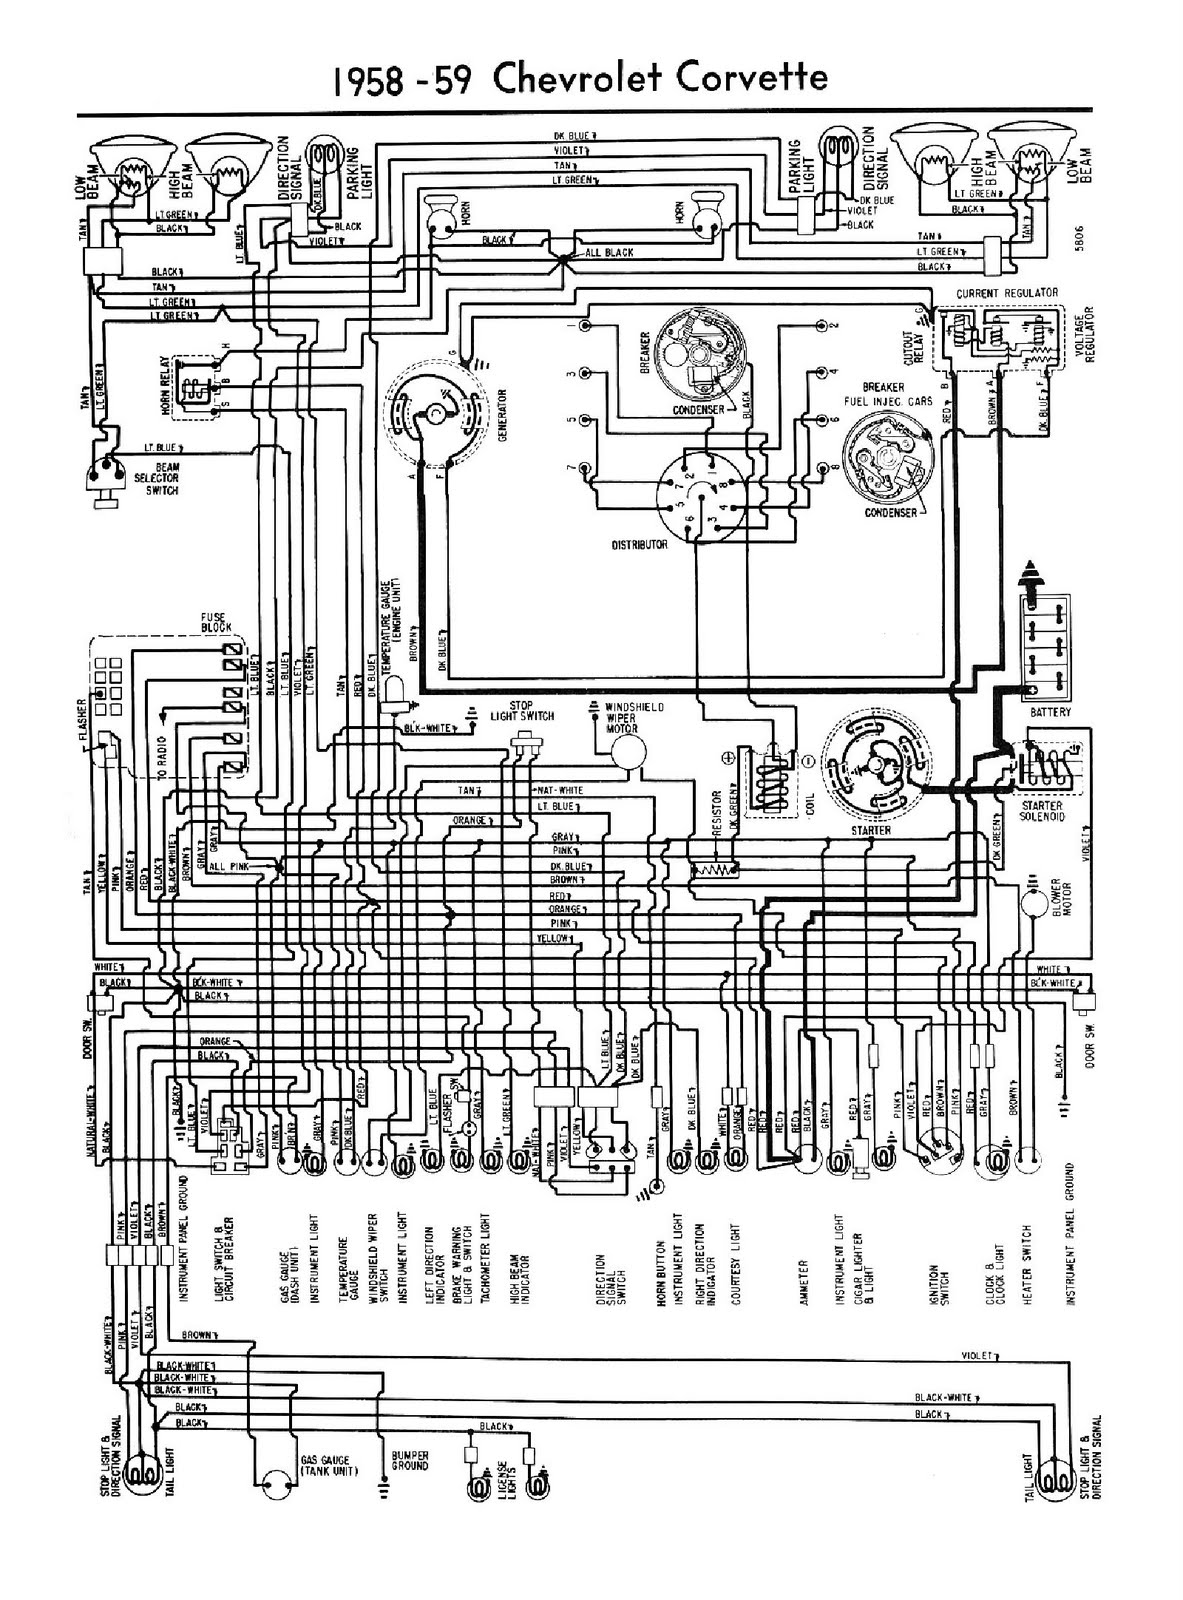 1958 Corvette Wiring Diagram Temp - Wiring Diagrams Show on